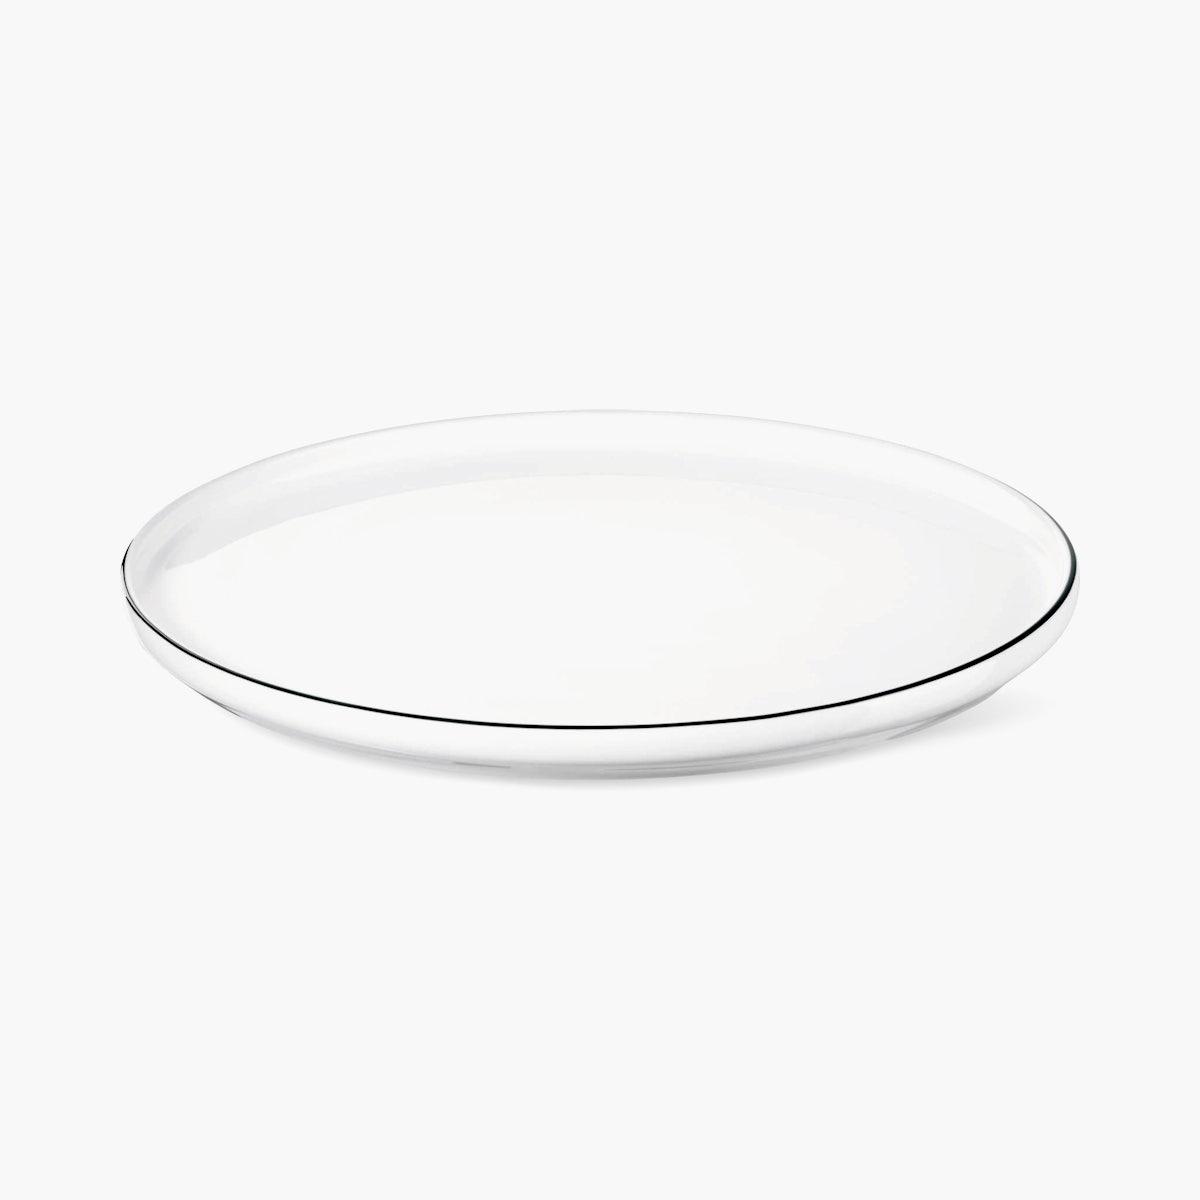 Oco Dessert Plates, Set of 6